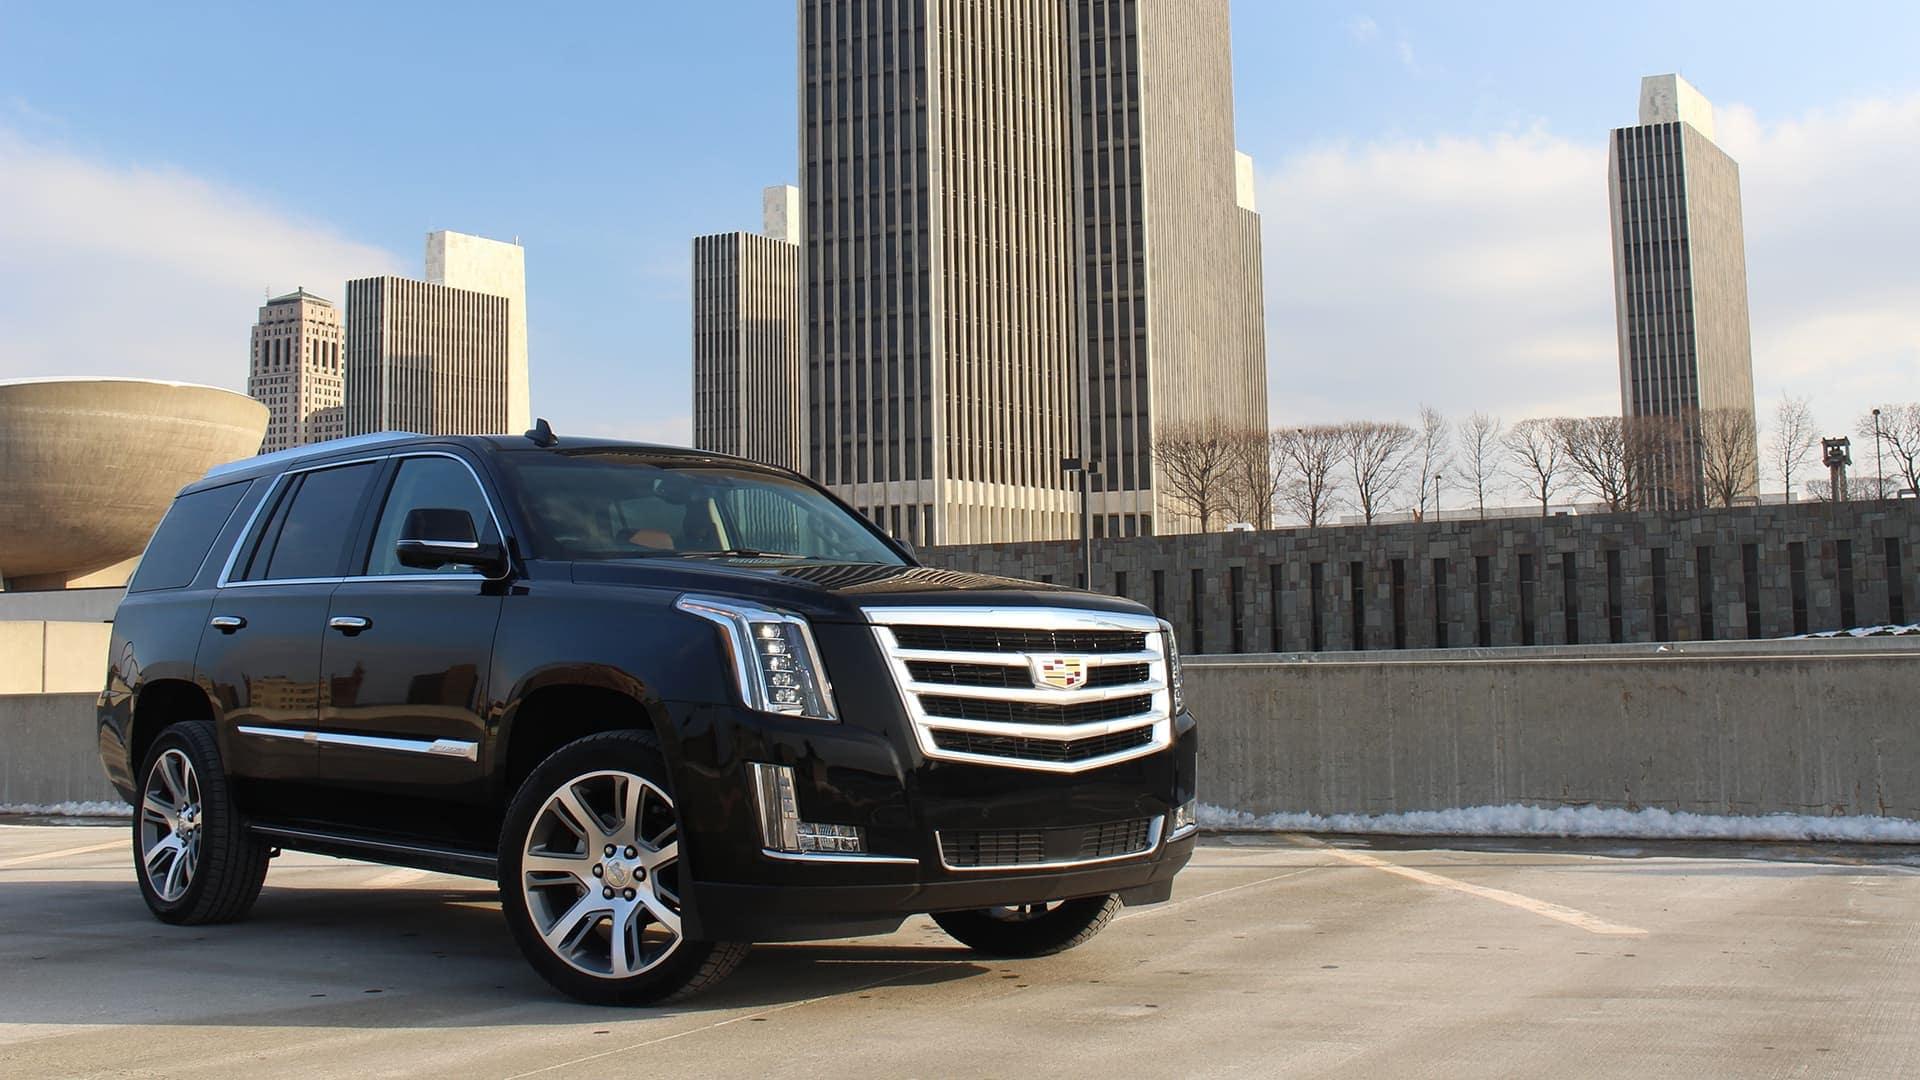 Cadillac Midlothian Dealership